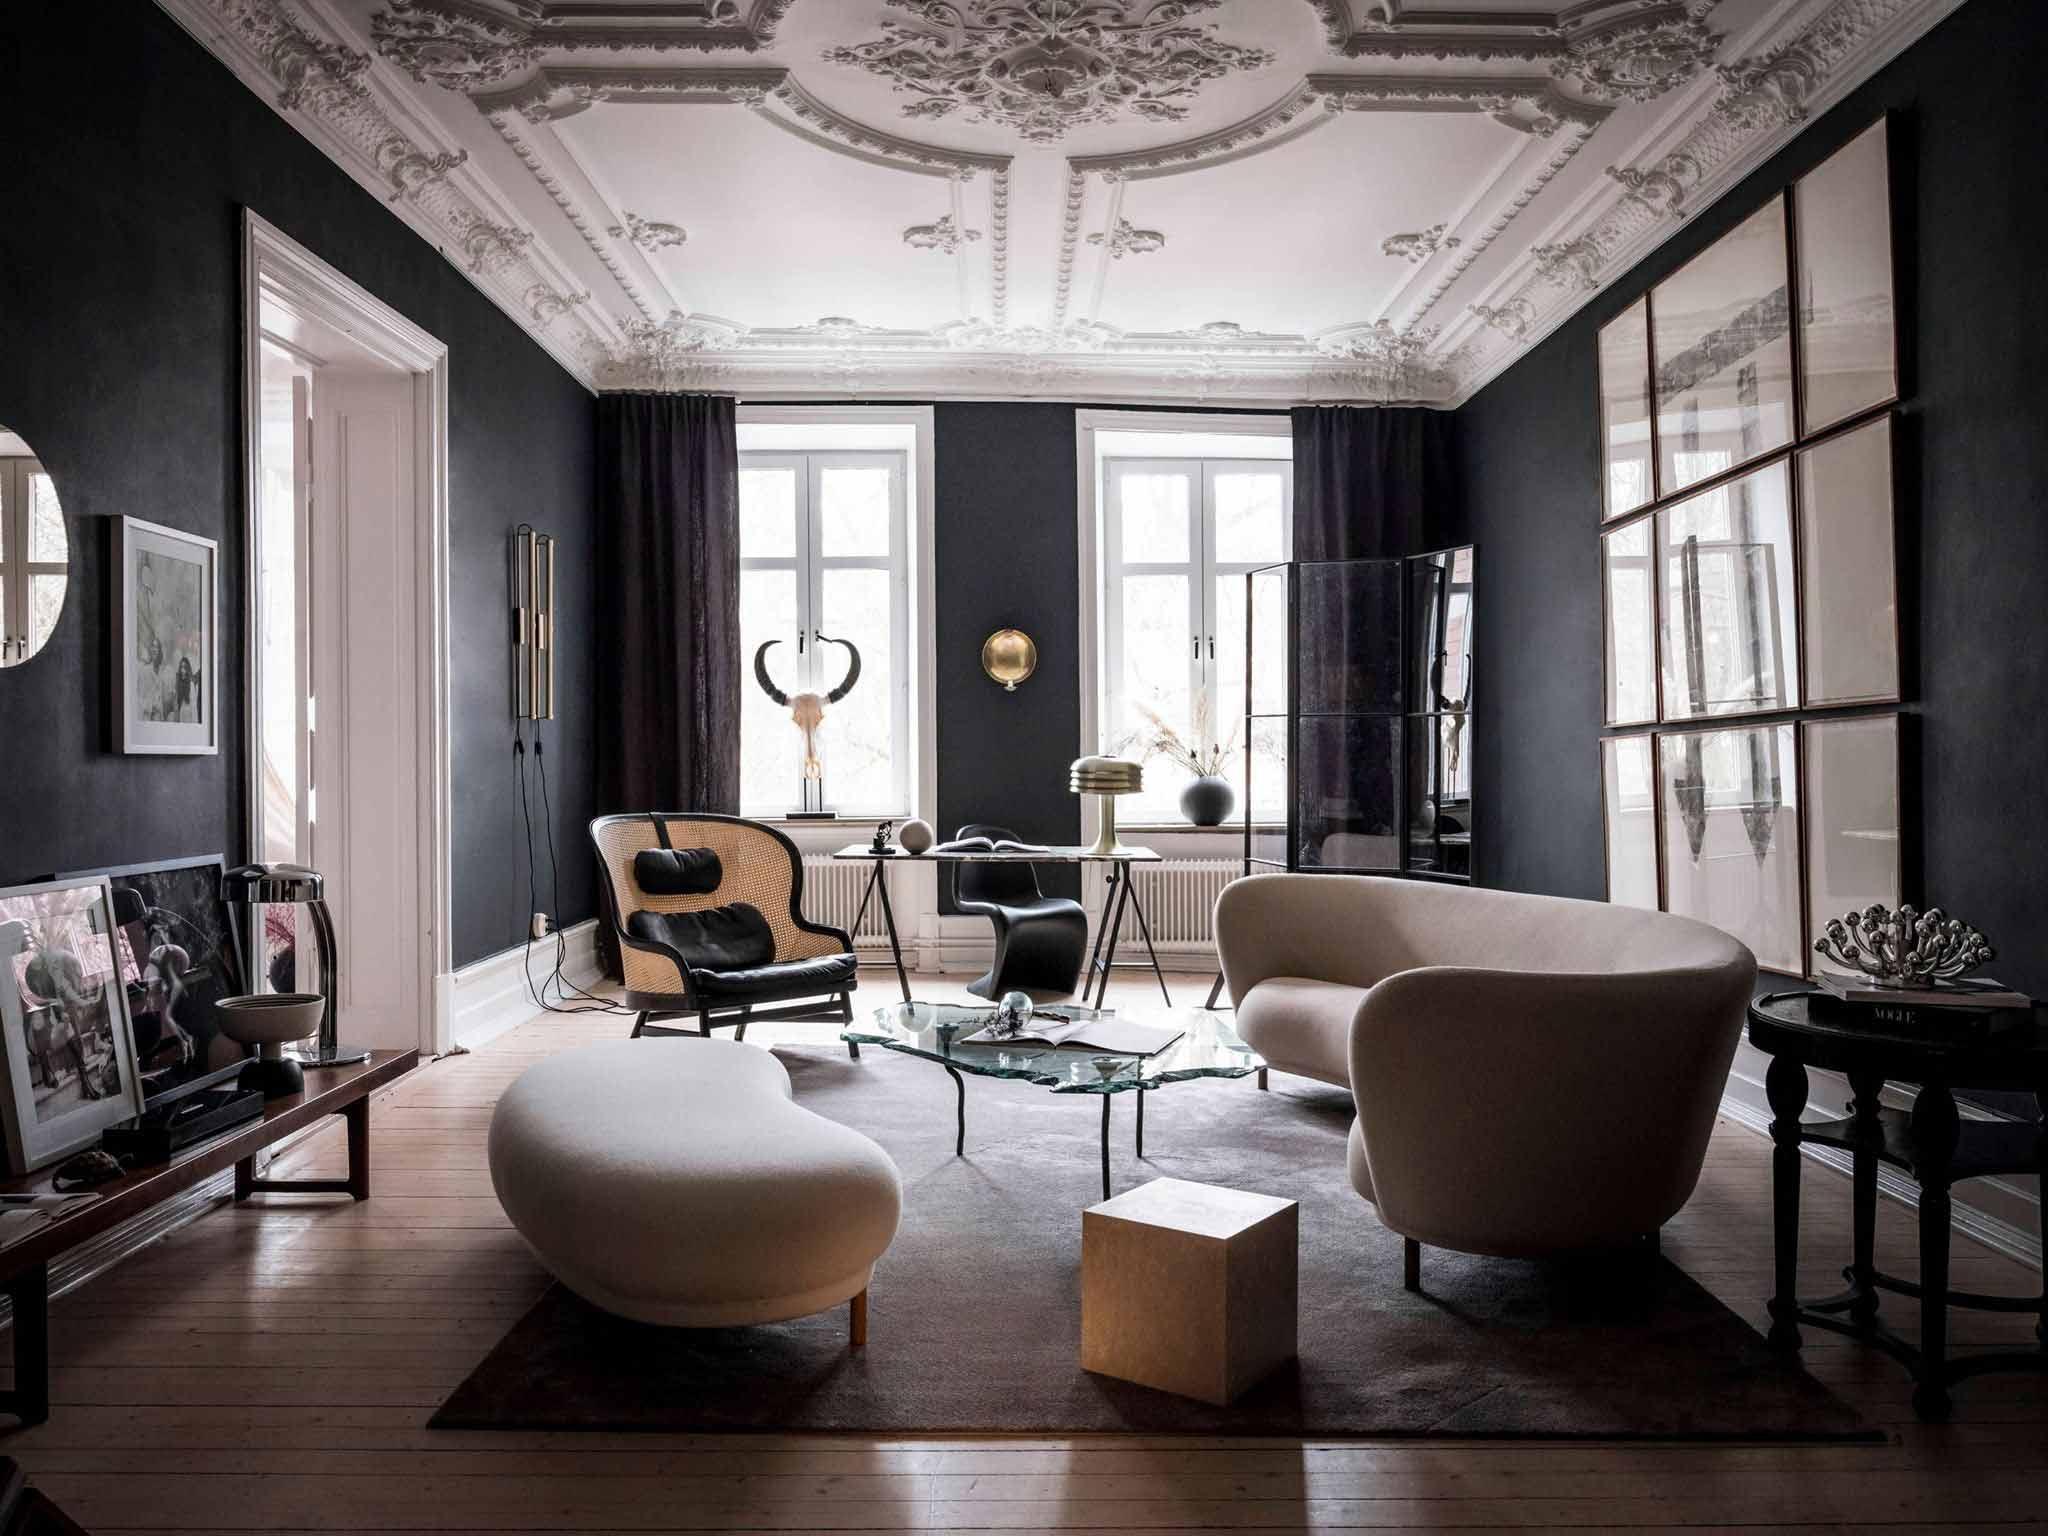 interior of mouche collective interior design shop